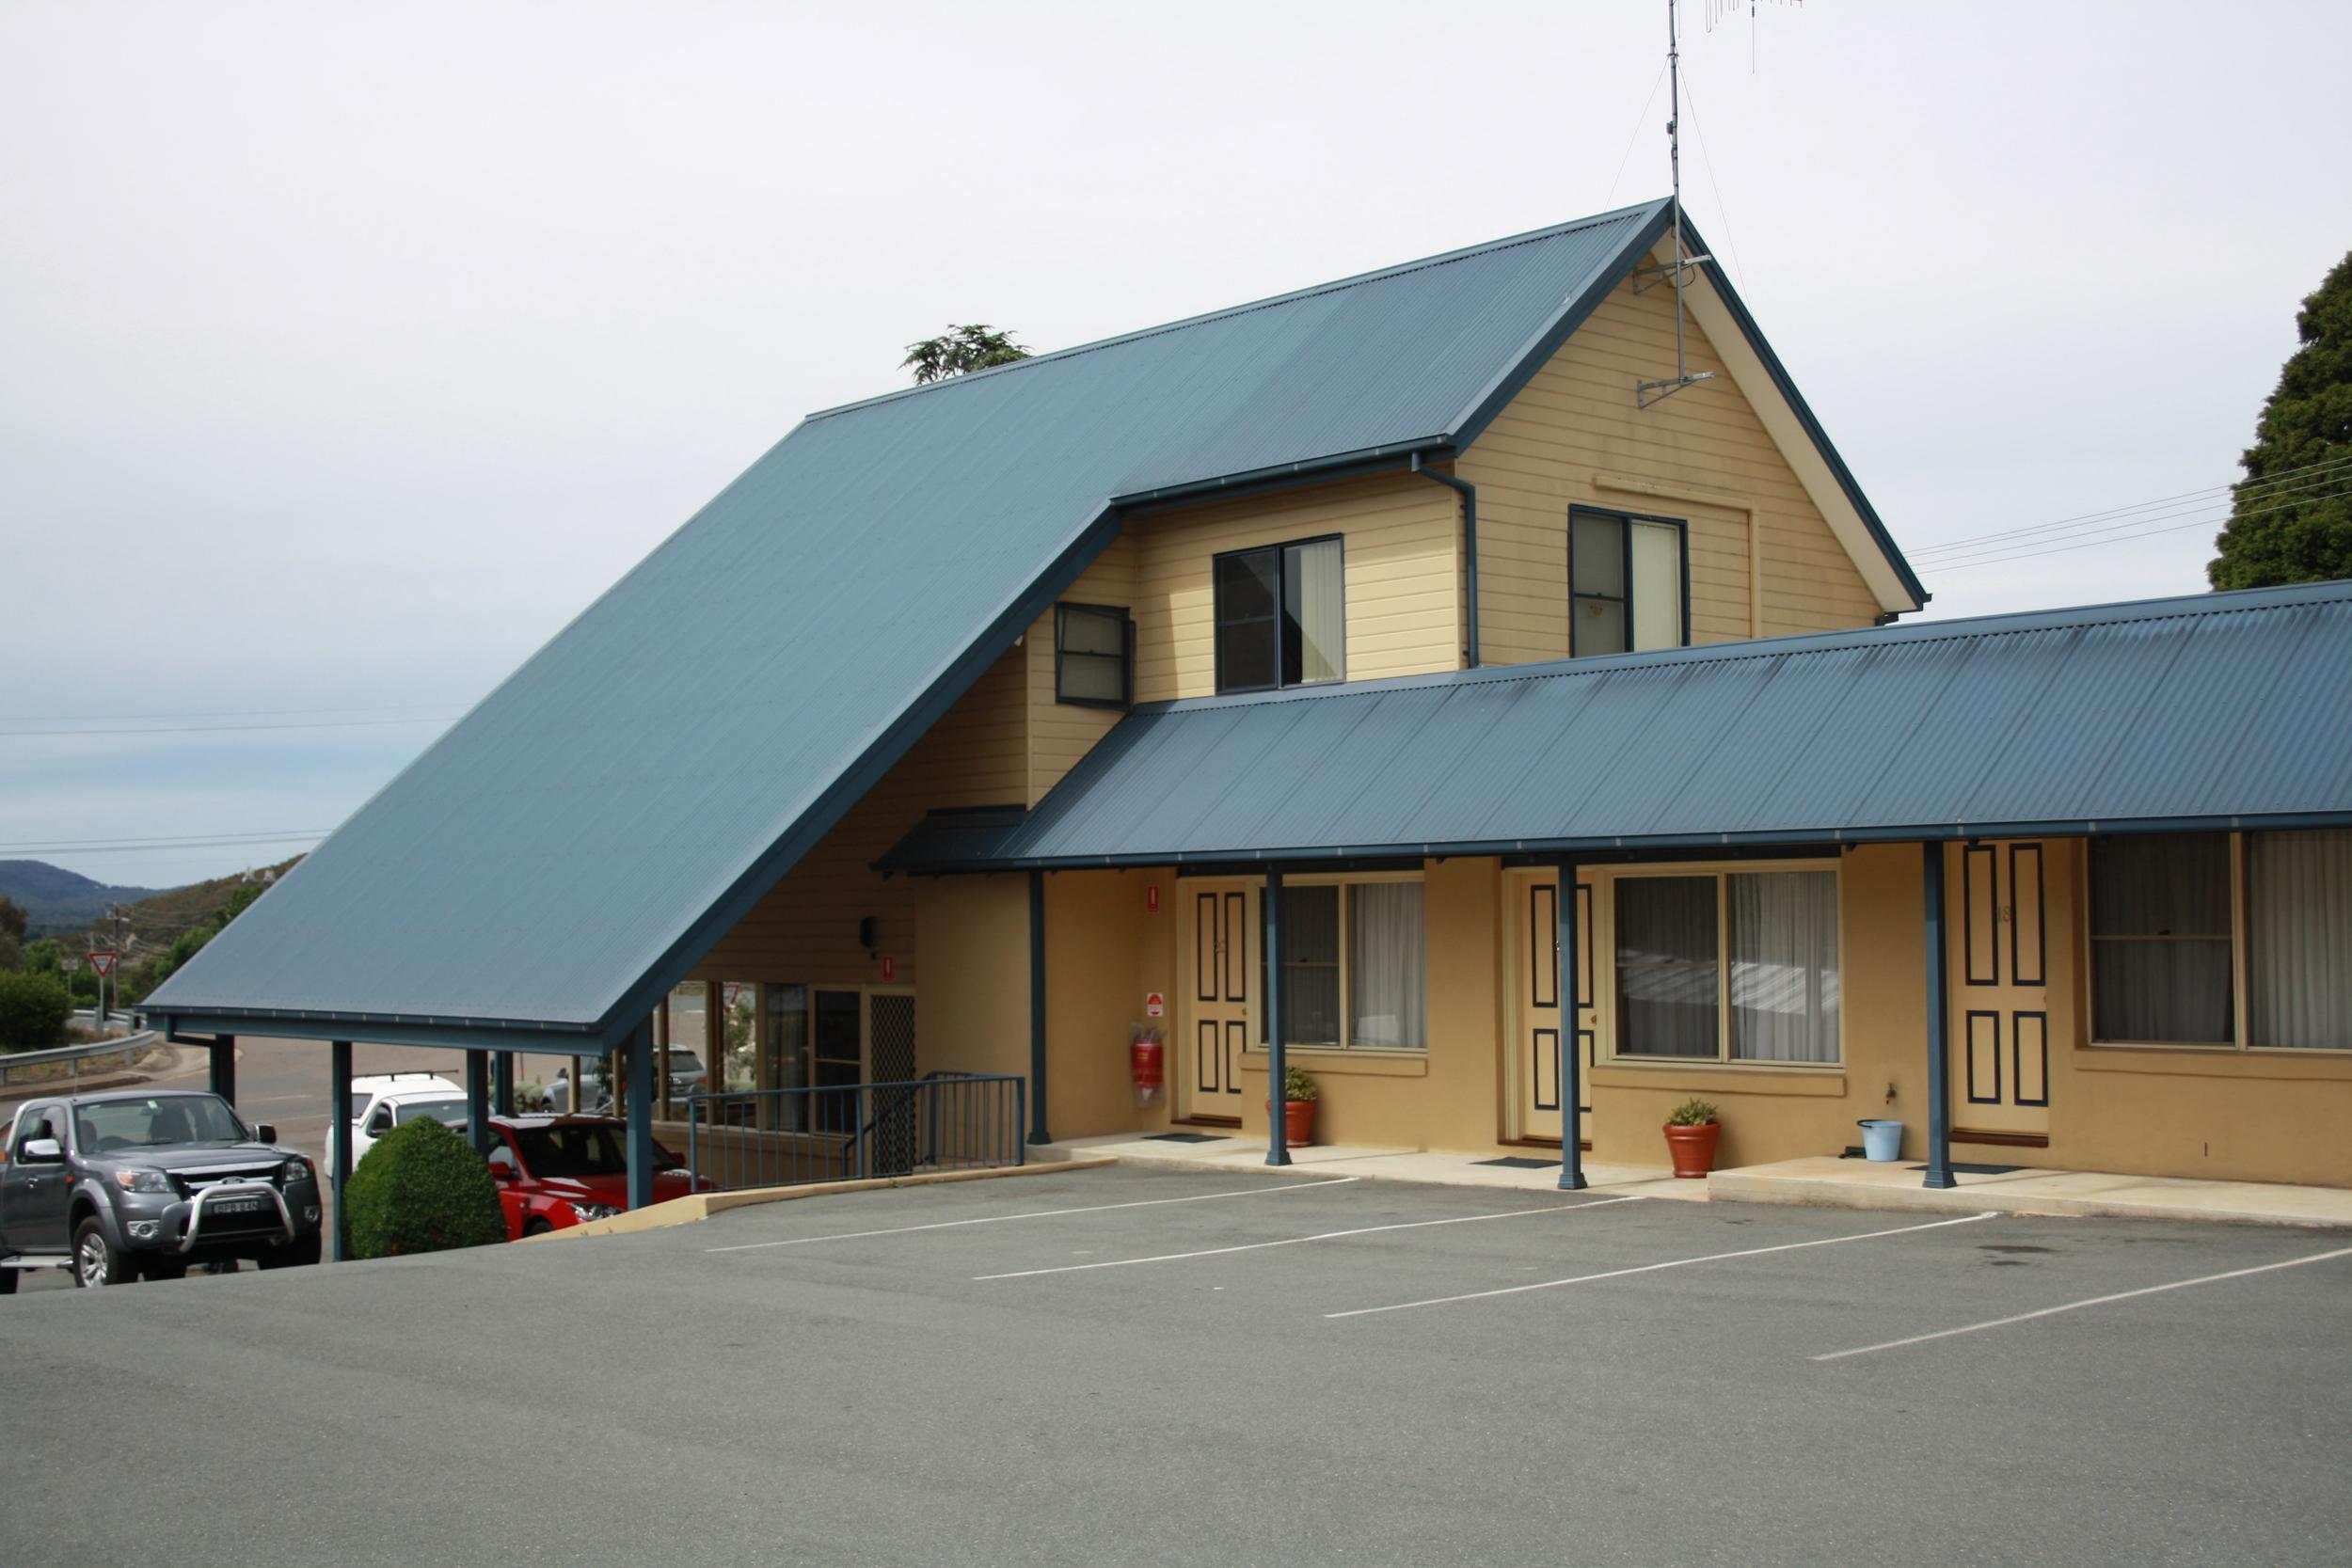 Andrew_Economos_Custom_Builder_Bowral_NSW_Australia_Country_Hotel_6.JPG